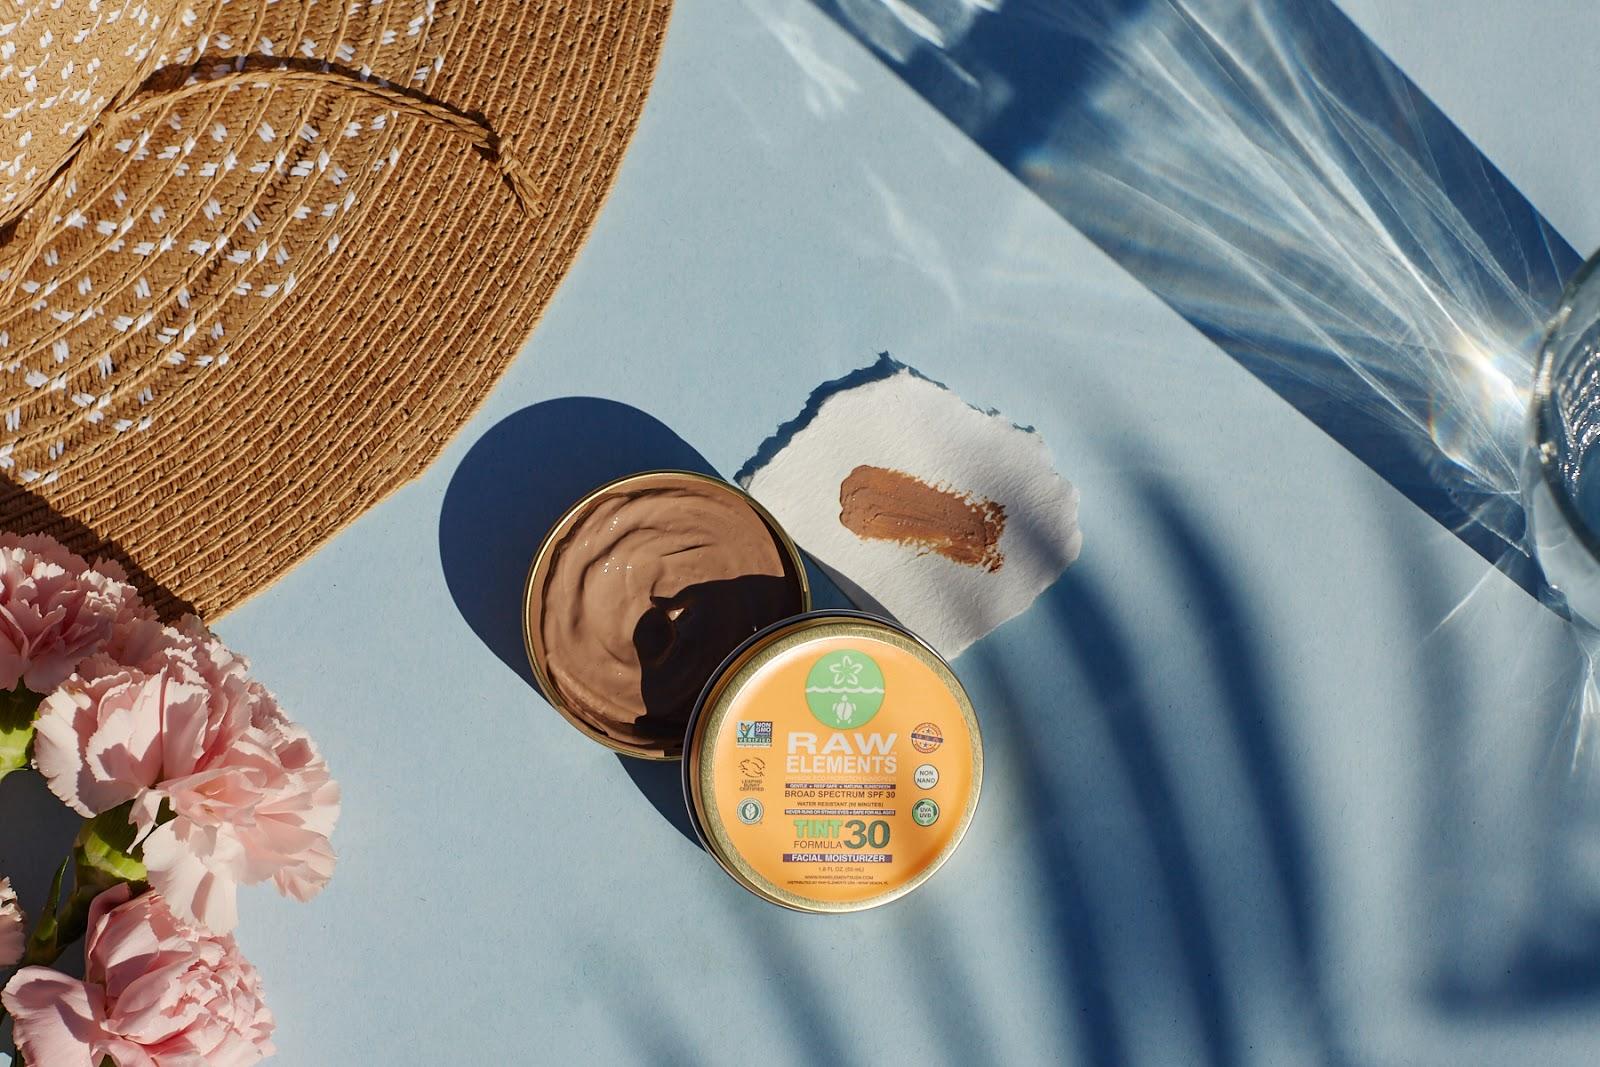 Raw Elements Facial Moisturizer Tint SPF 30 natural organic nontoxic sunscreen hellolindasau